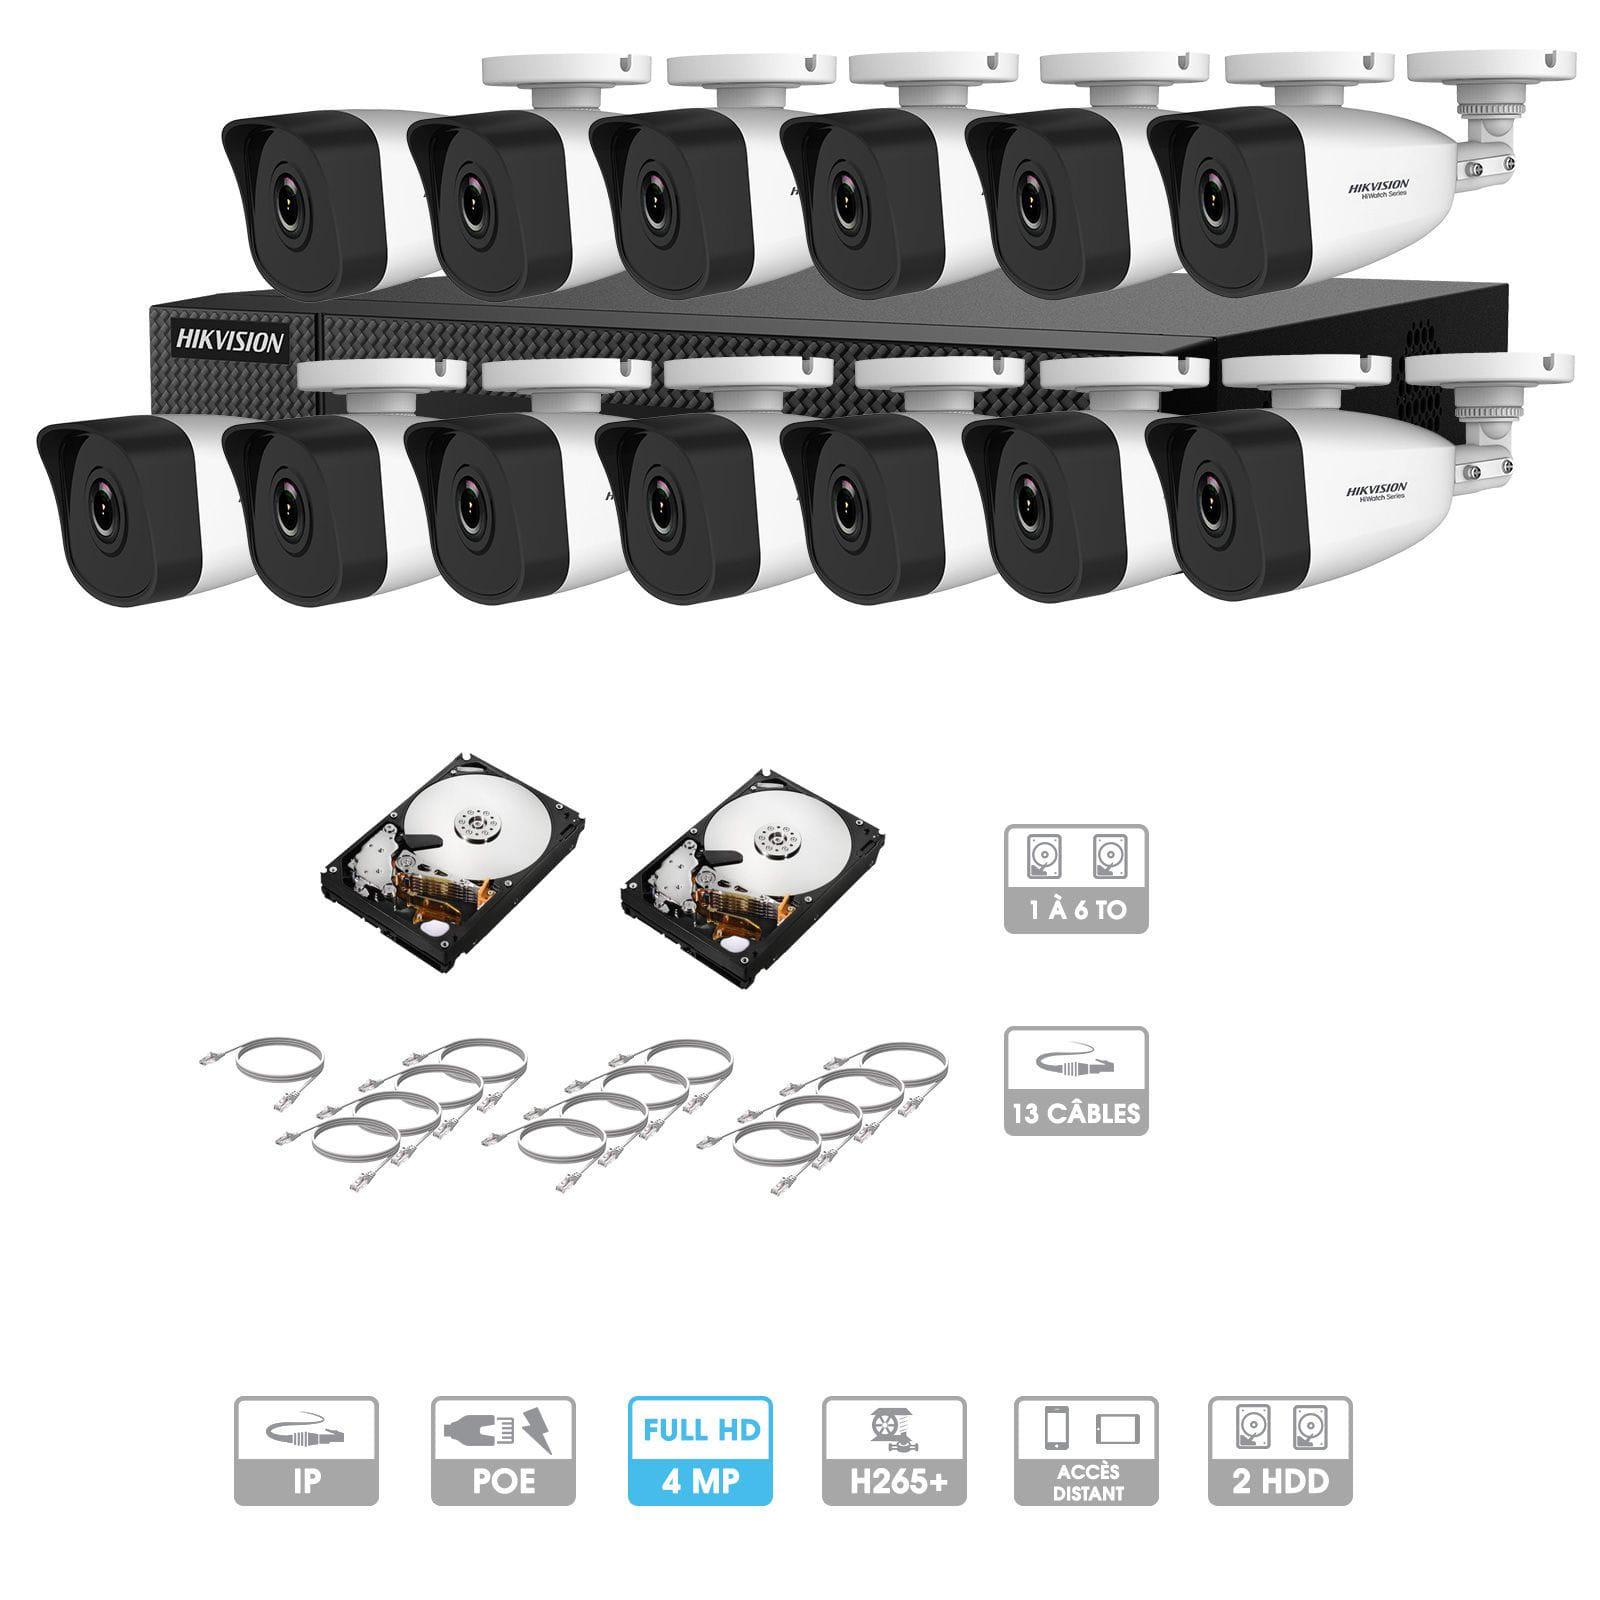 Kit vidéosurveillance 13 caméras | 4 MP | IP PoE | 13 câbles RJ45 20/30/40/50 mètres | 2 HDD 1 à 6 To | Tubes Hiwatch